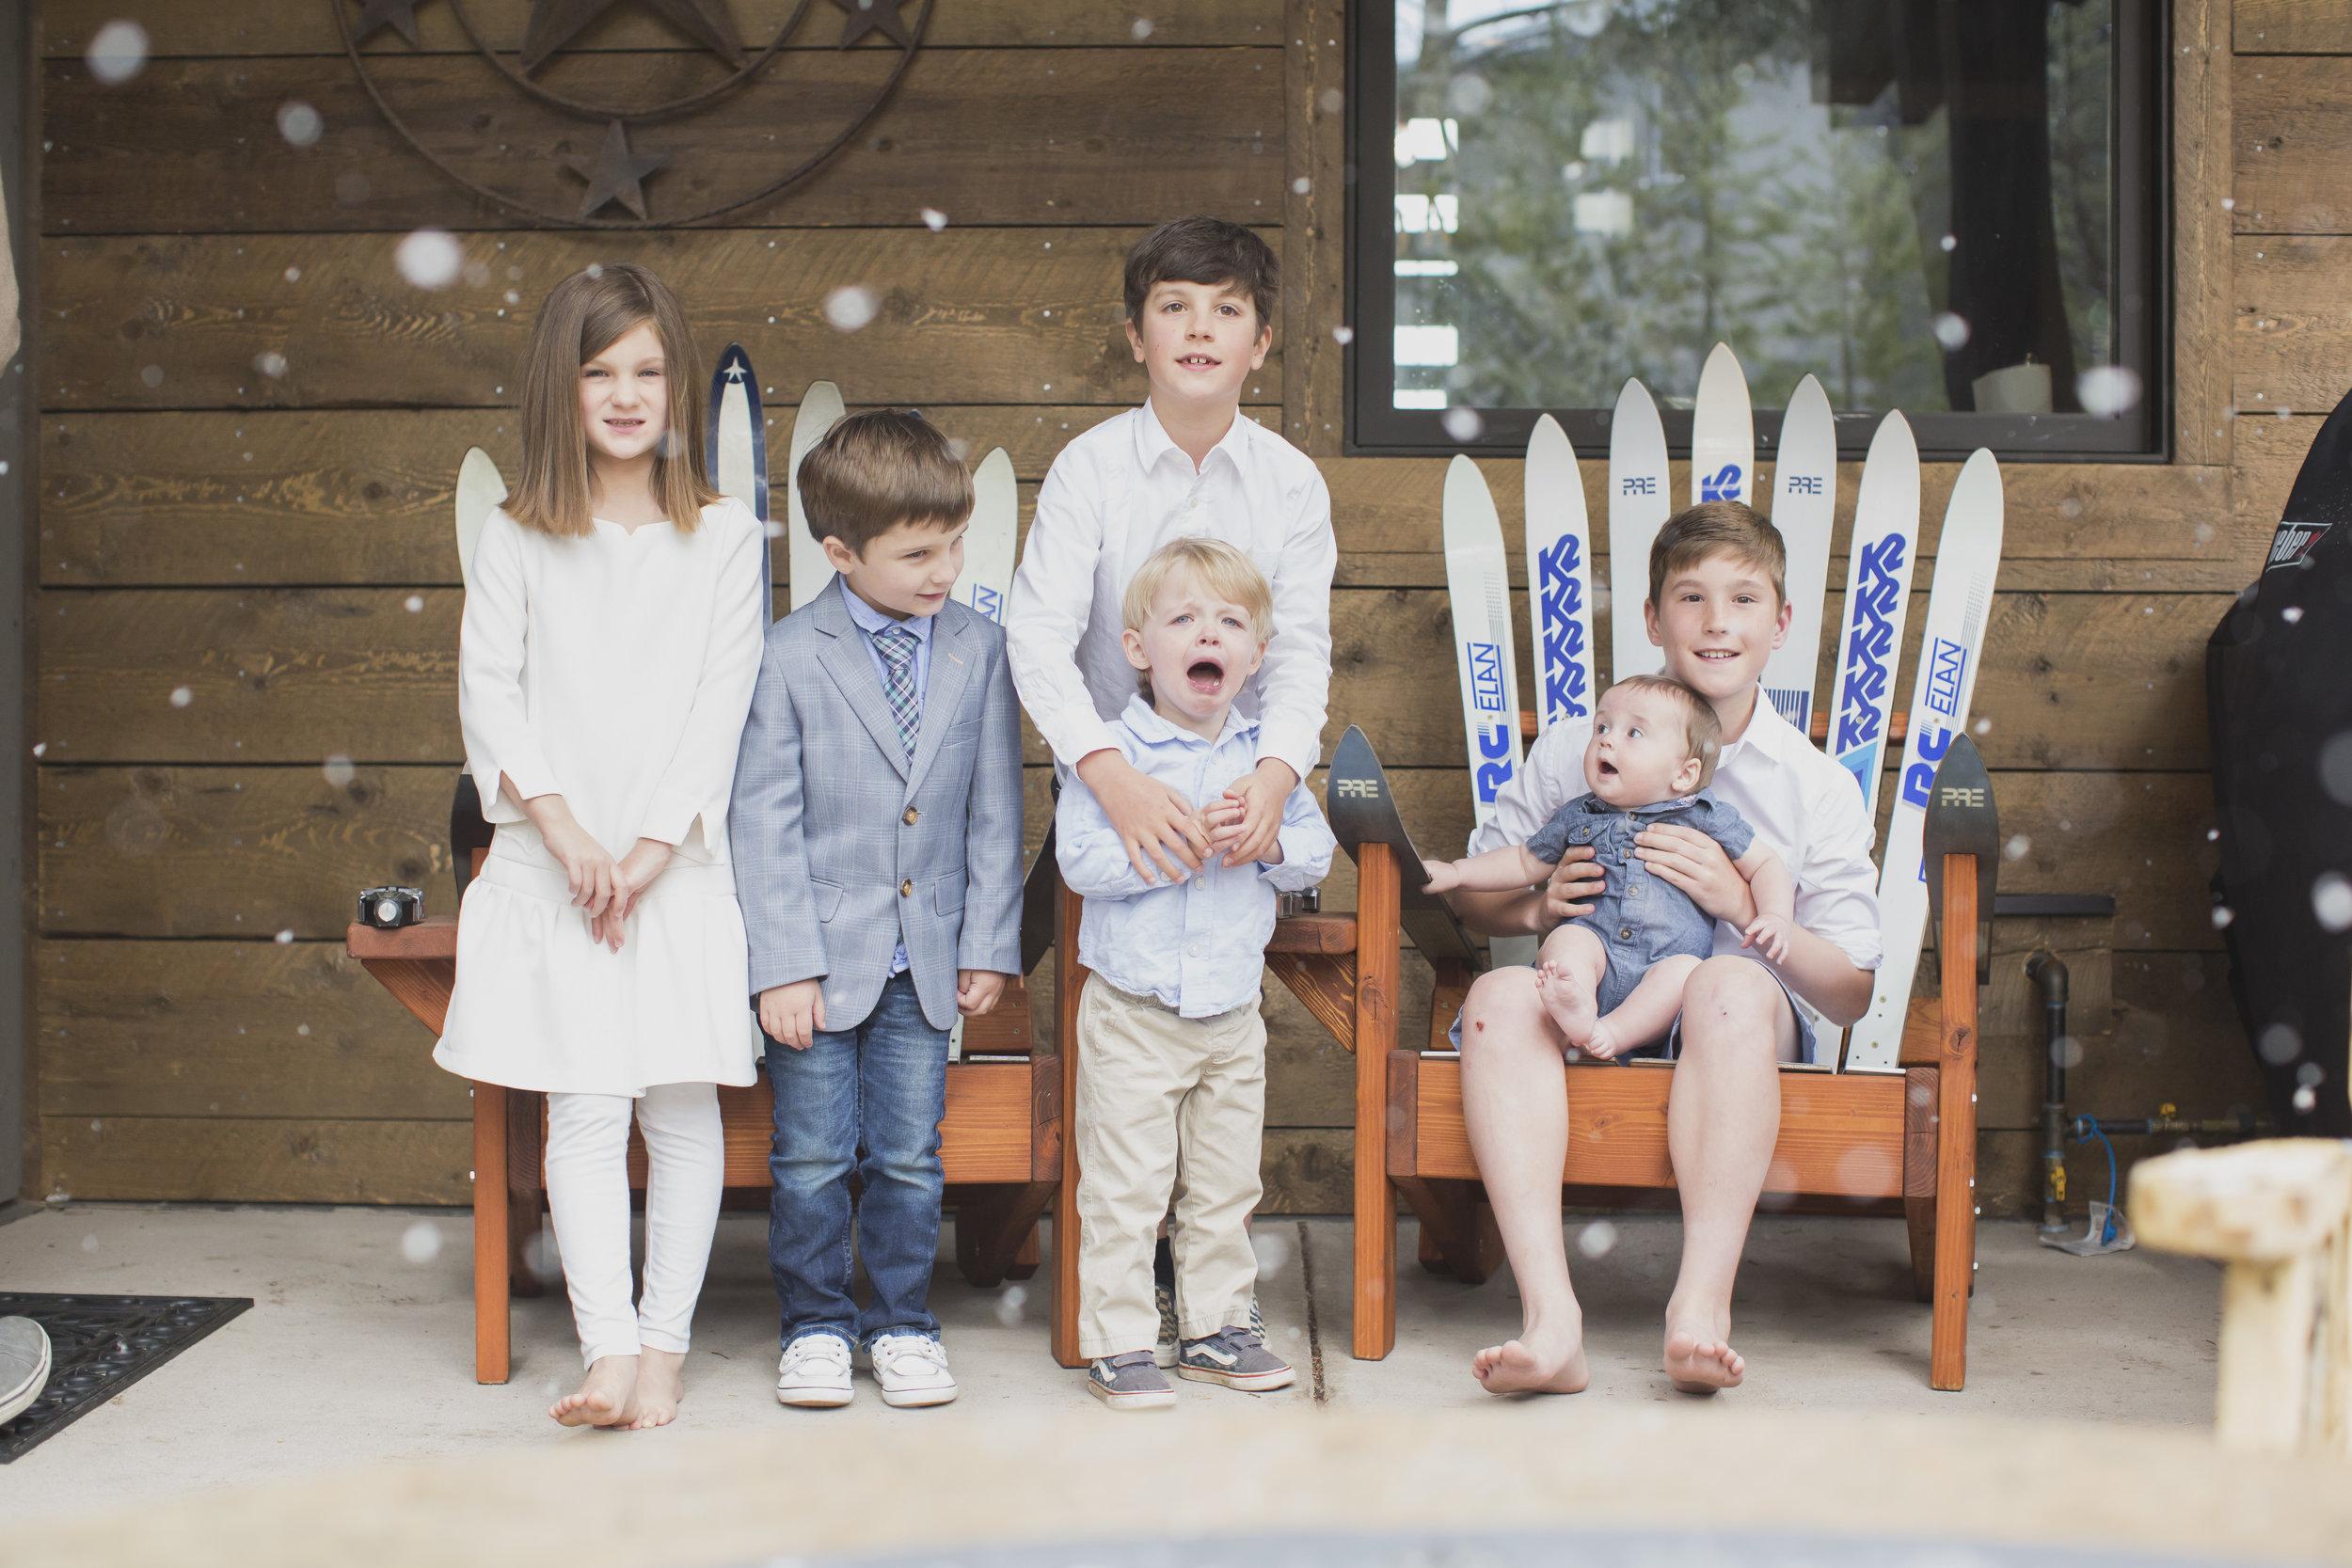 kristen-vance-2017-spring-breckenridge-colorado-kids2.jpg